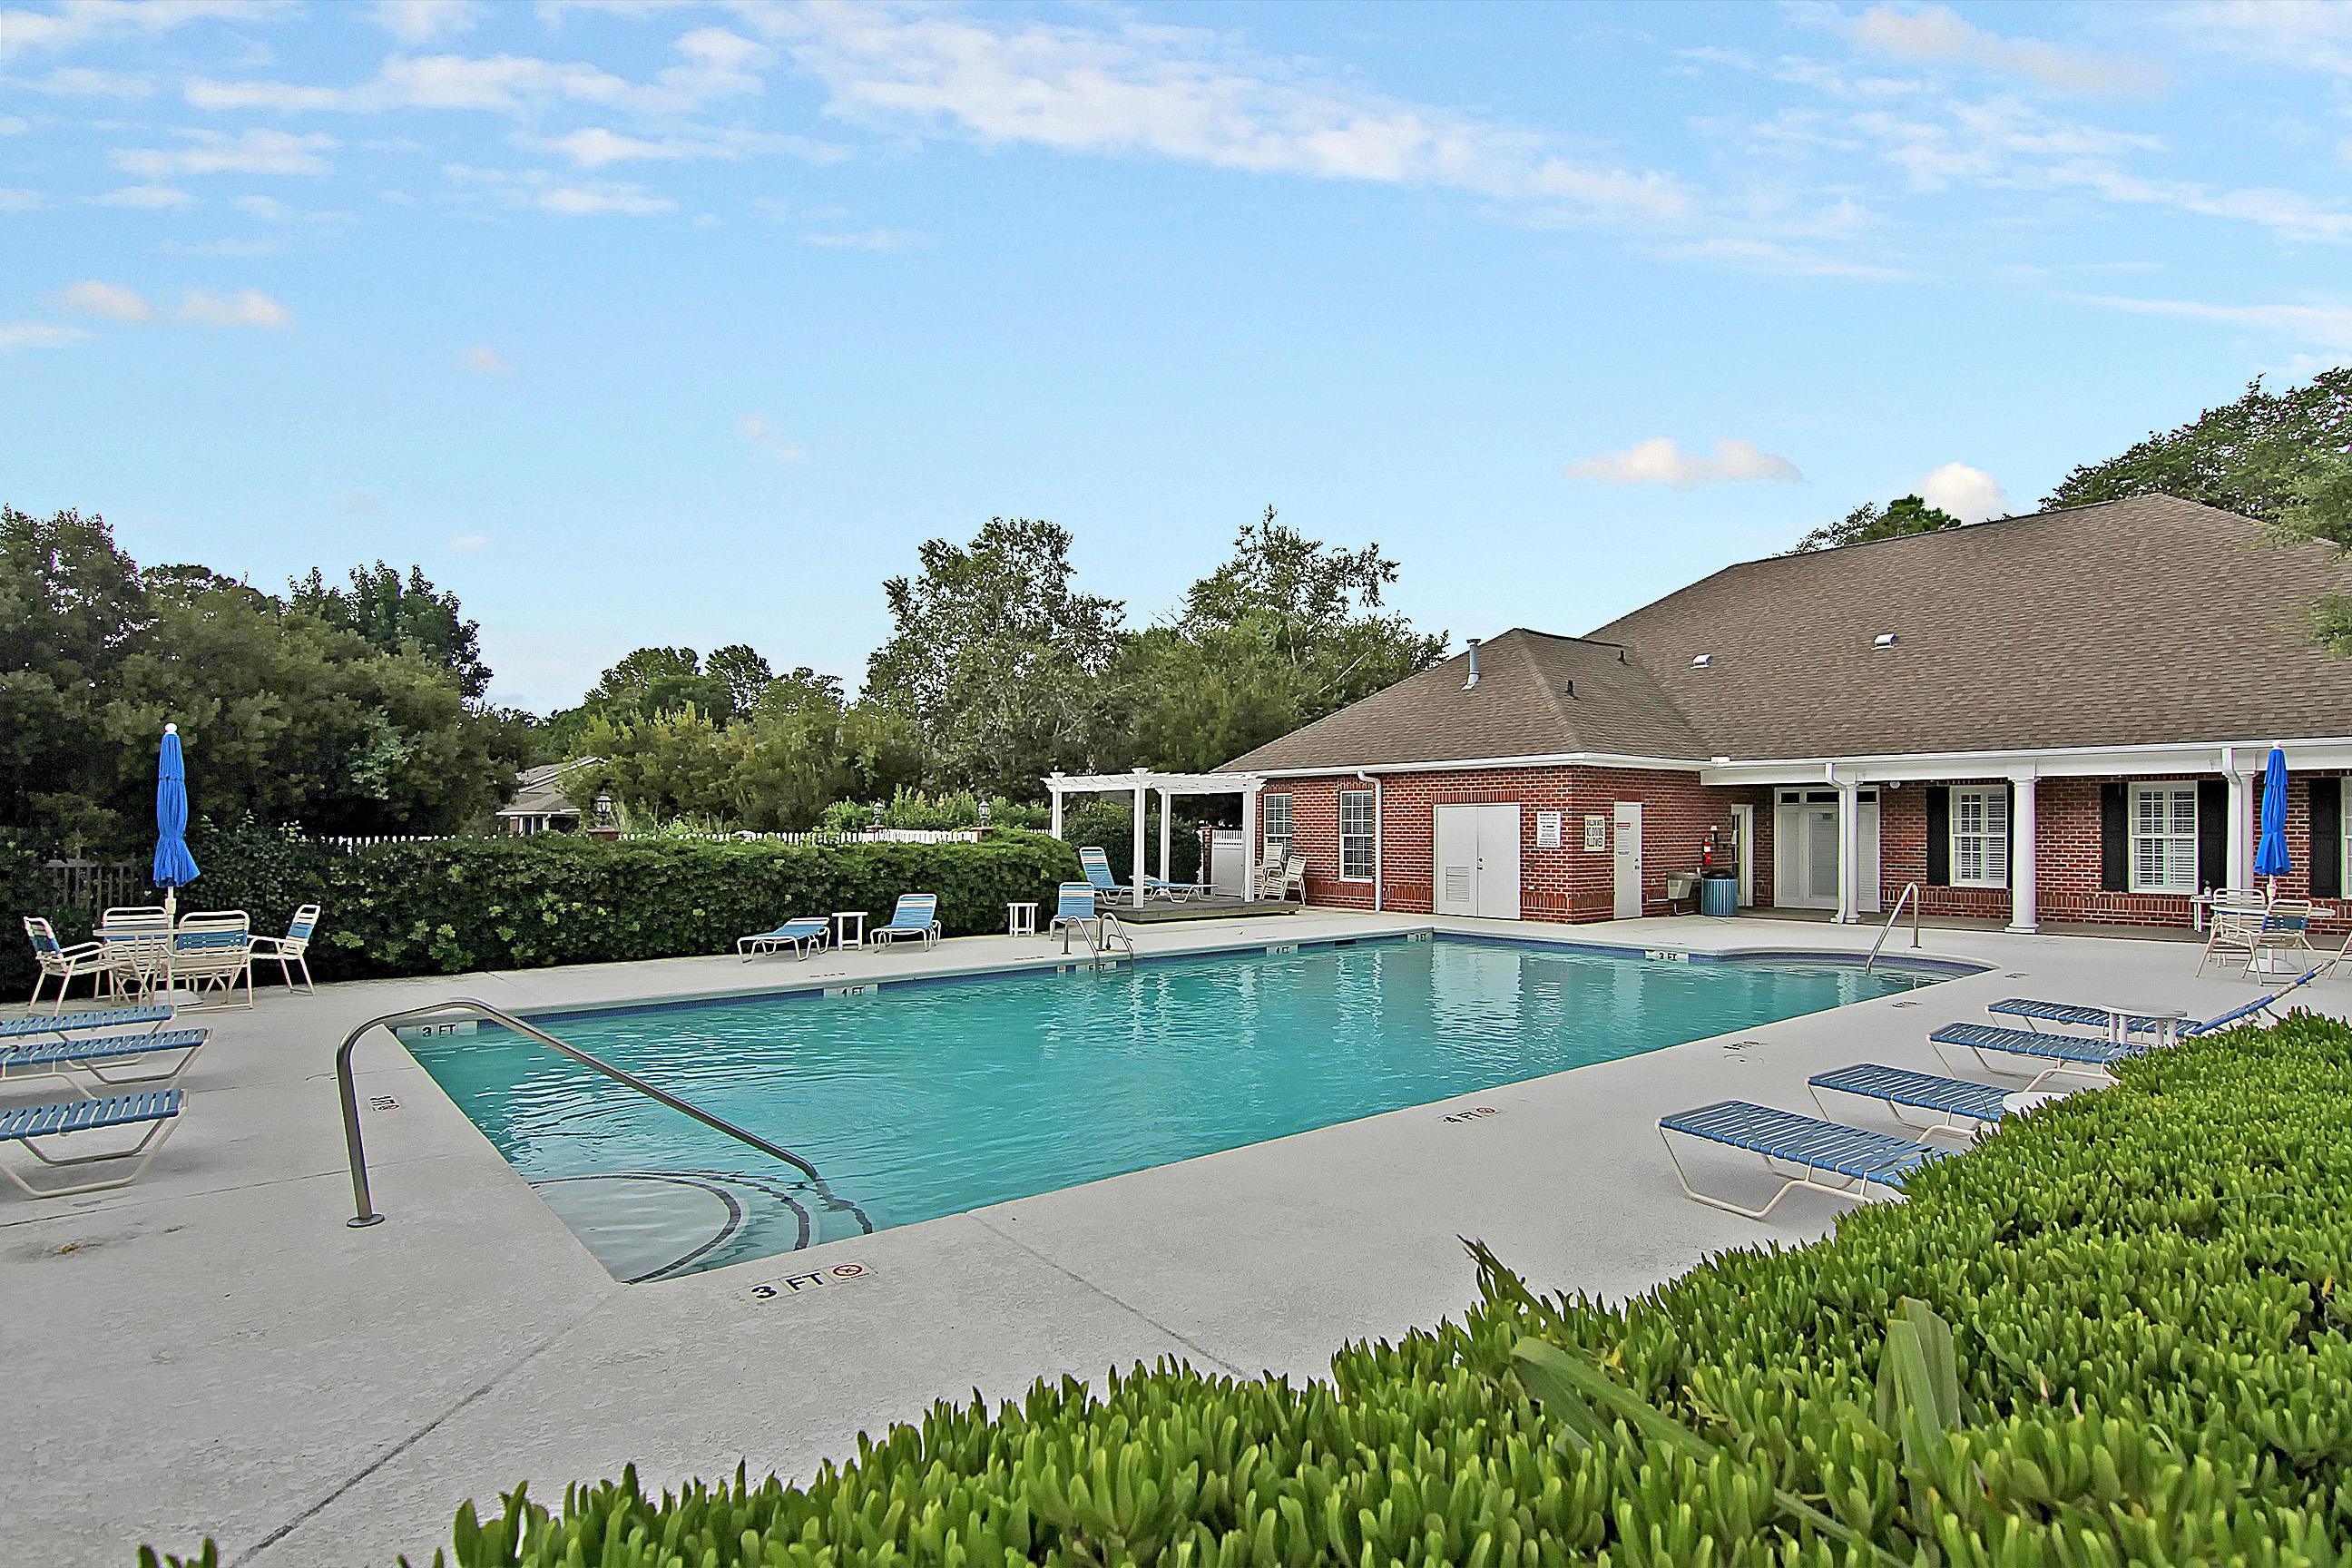 Cambridge Lakes Homes For Sale - 1445 Cambridge Lakes, Mount Pleasant, SC - 13